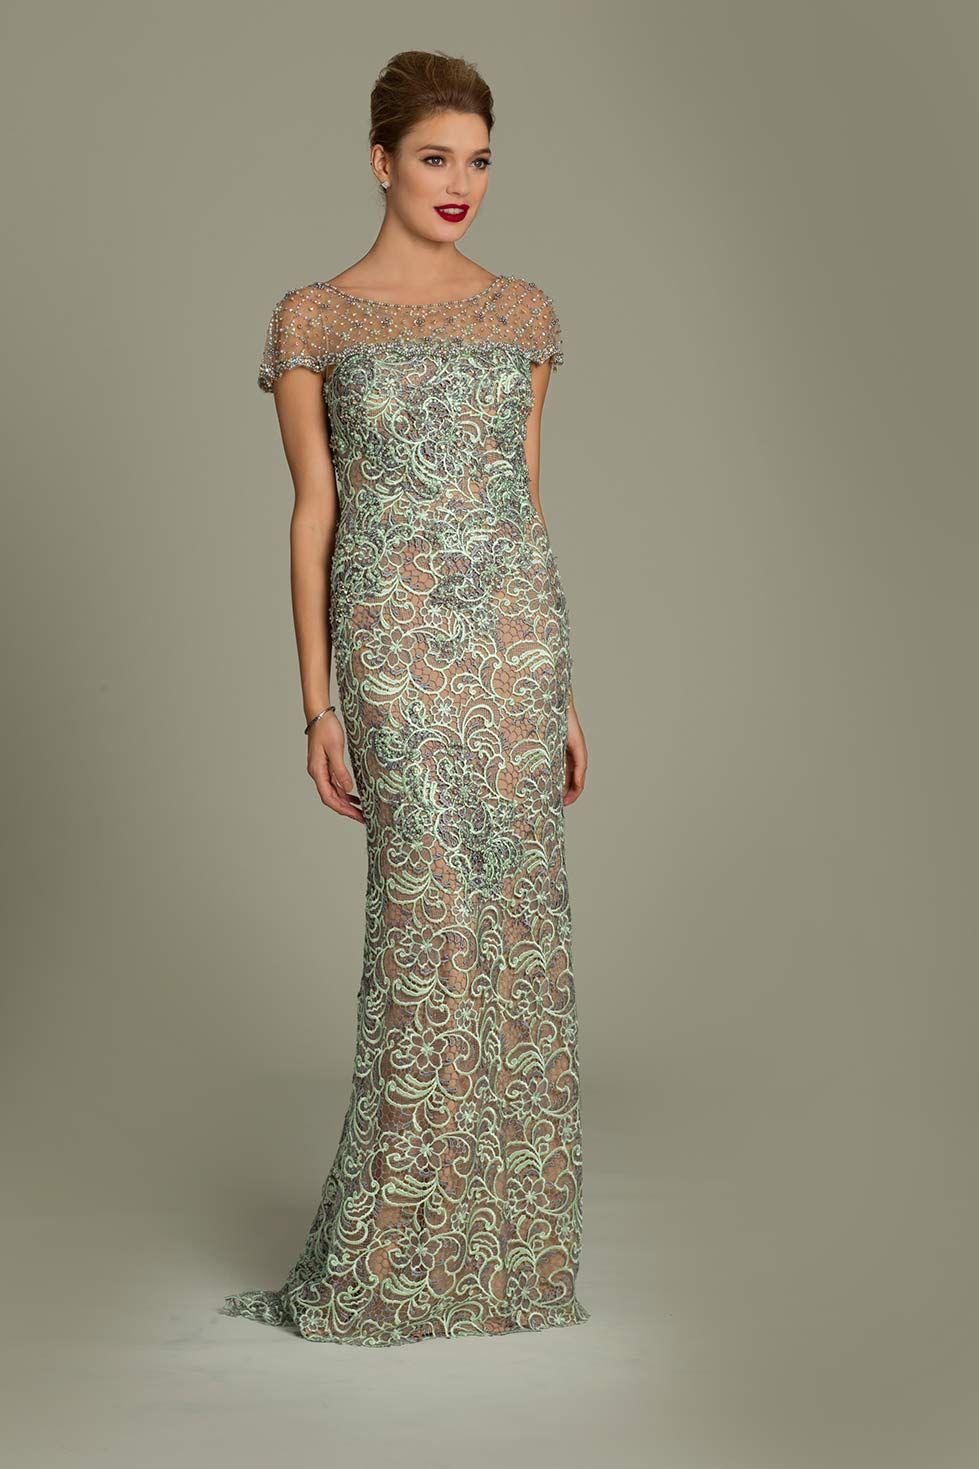 e13ad0a0e1 Jovani lace applique gown